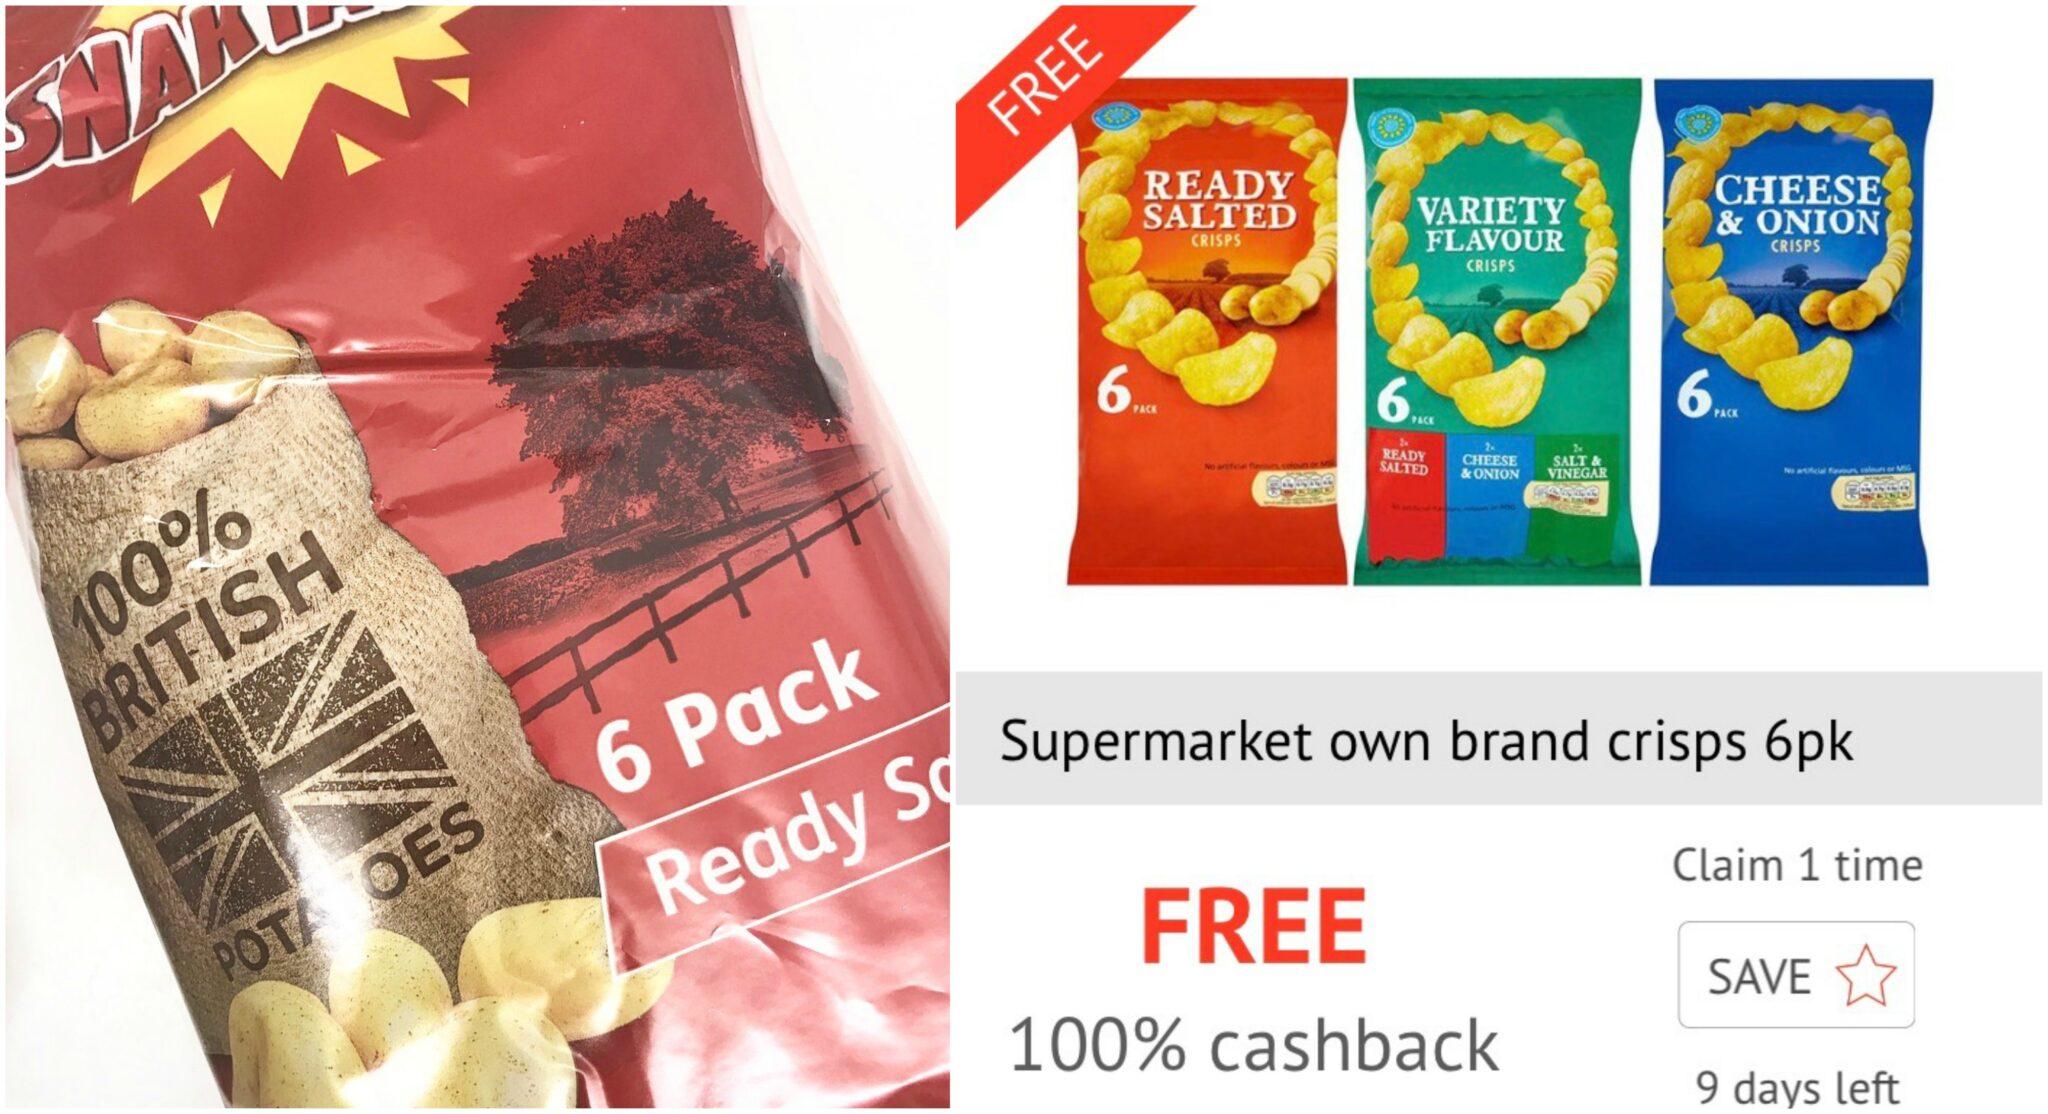 Free crisps on checkoutsmart